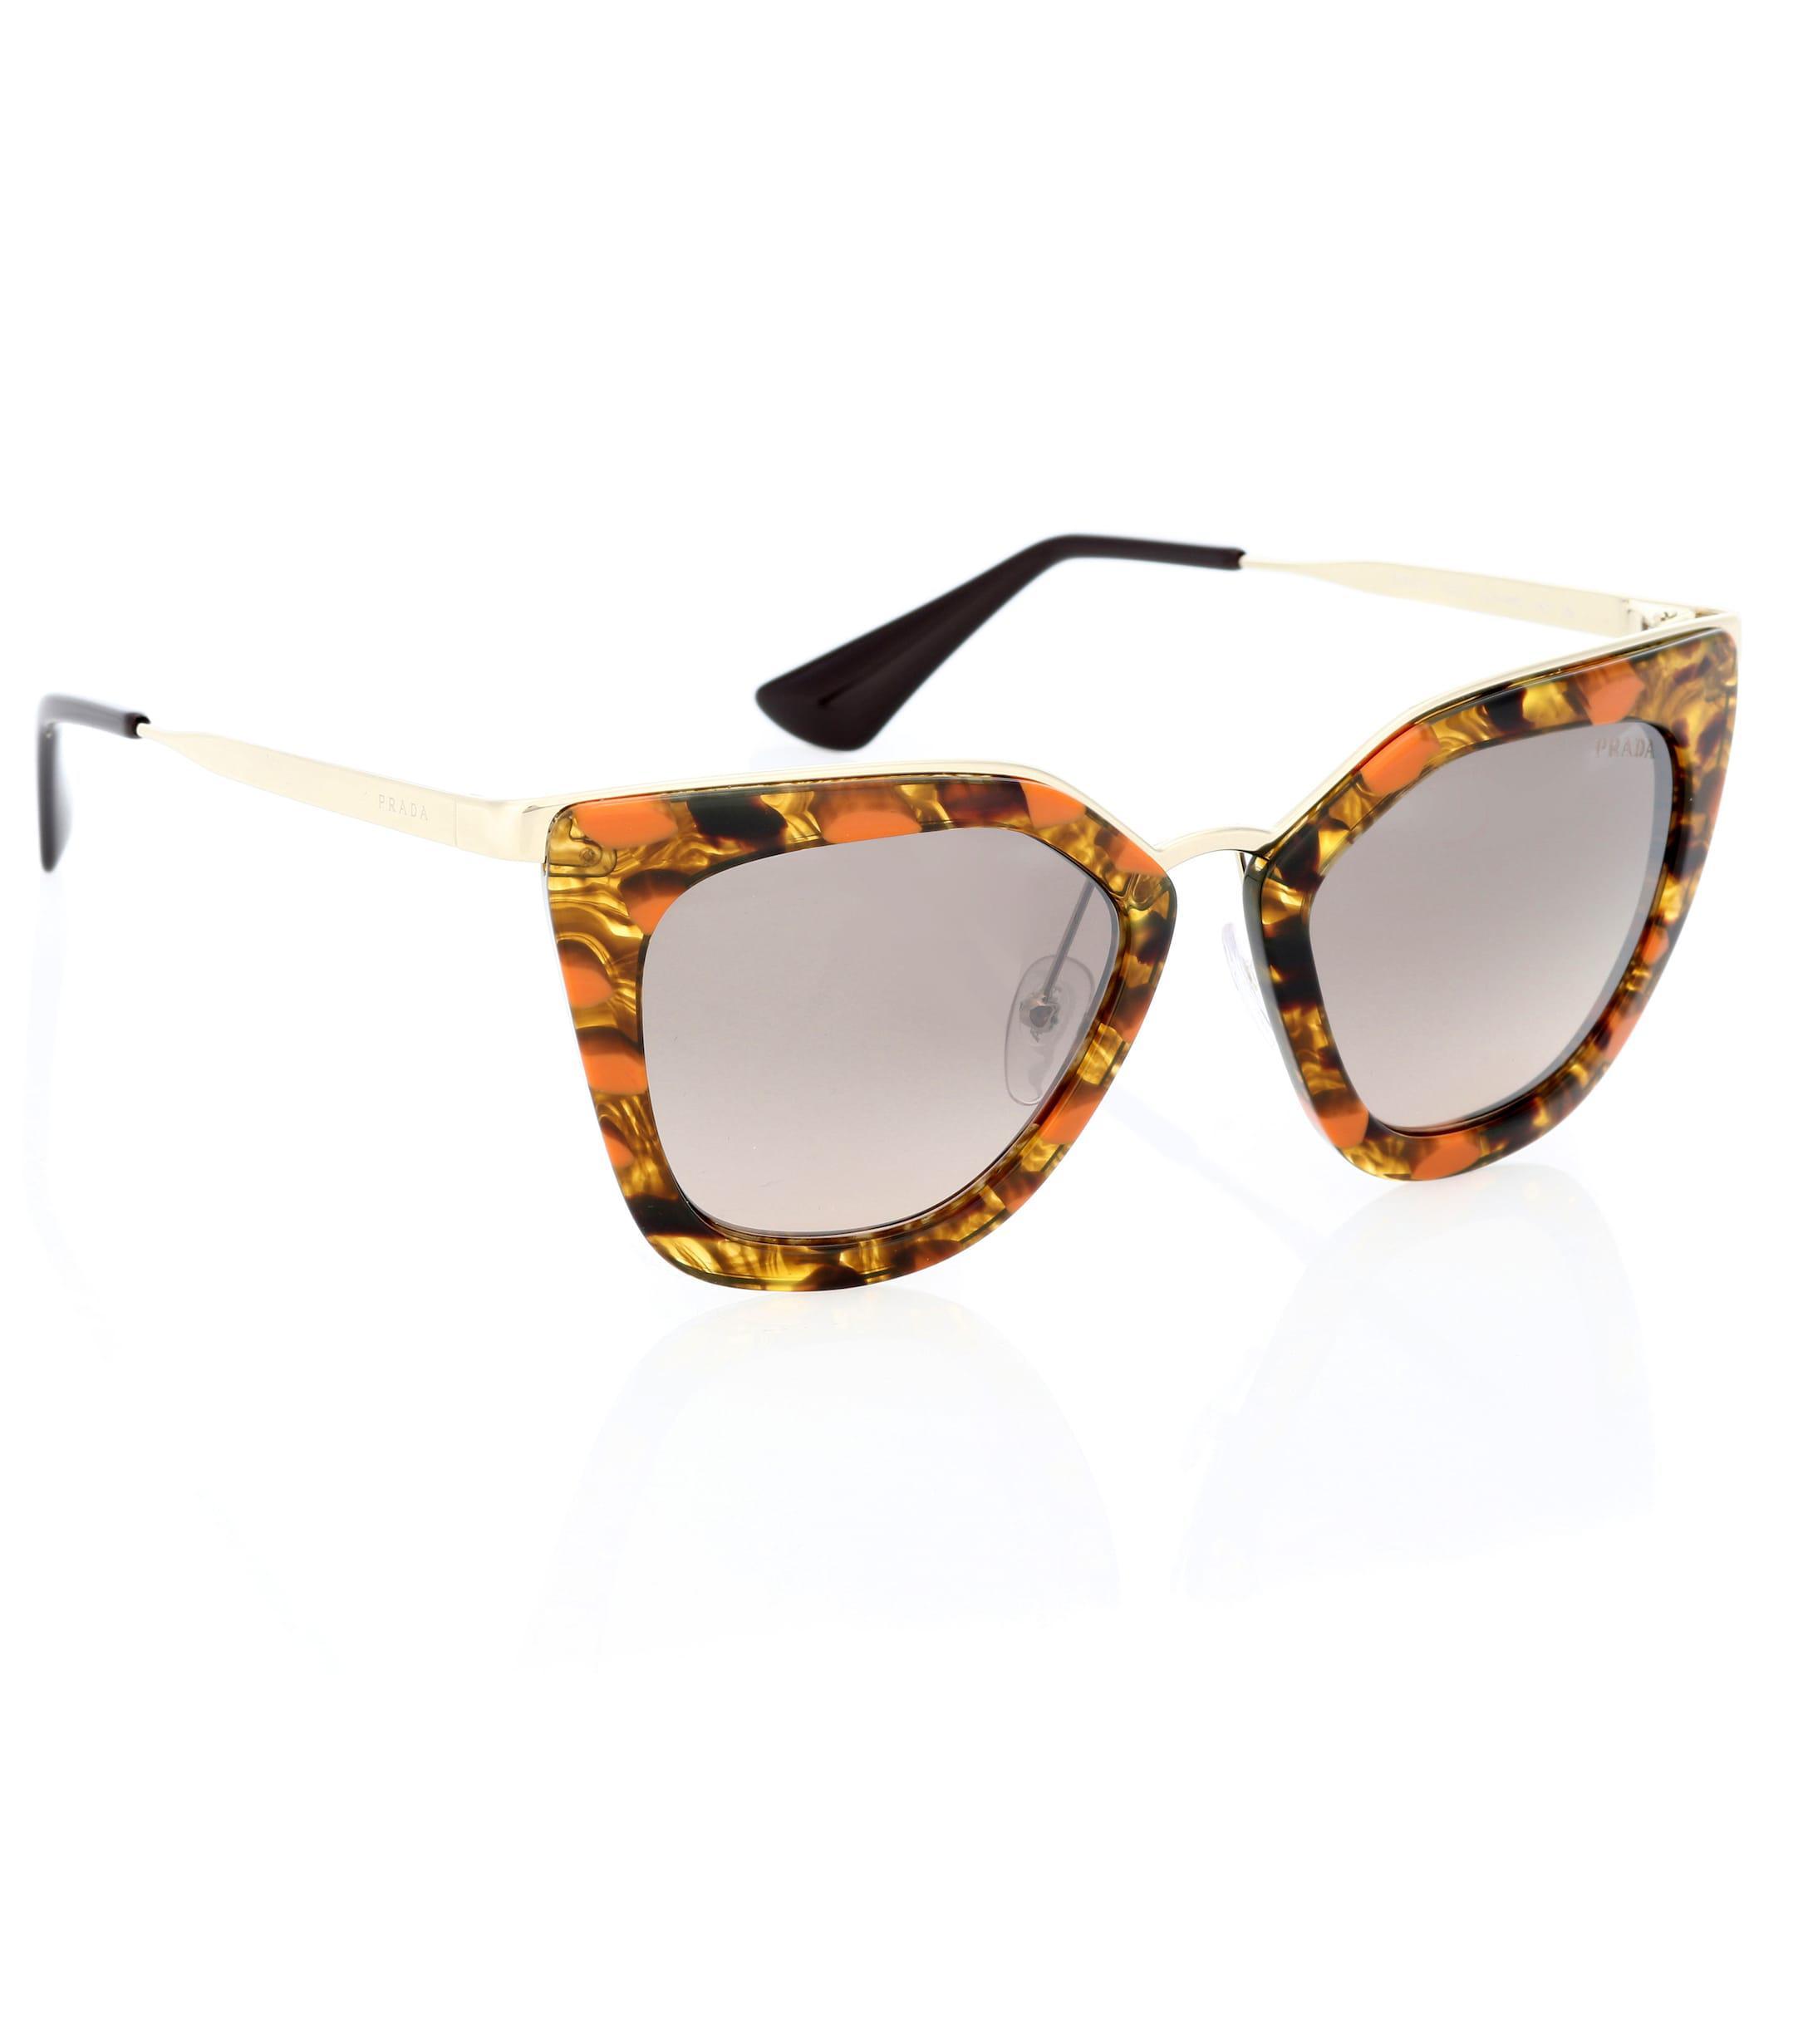 03b6f36072 Prada - Brown Cinéma Cat-eye Sunglasses - Lyst. View fullscreen